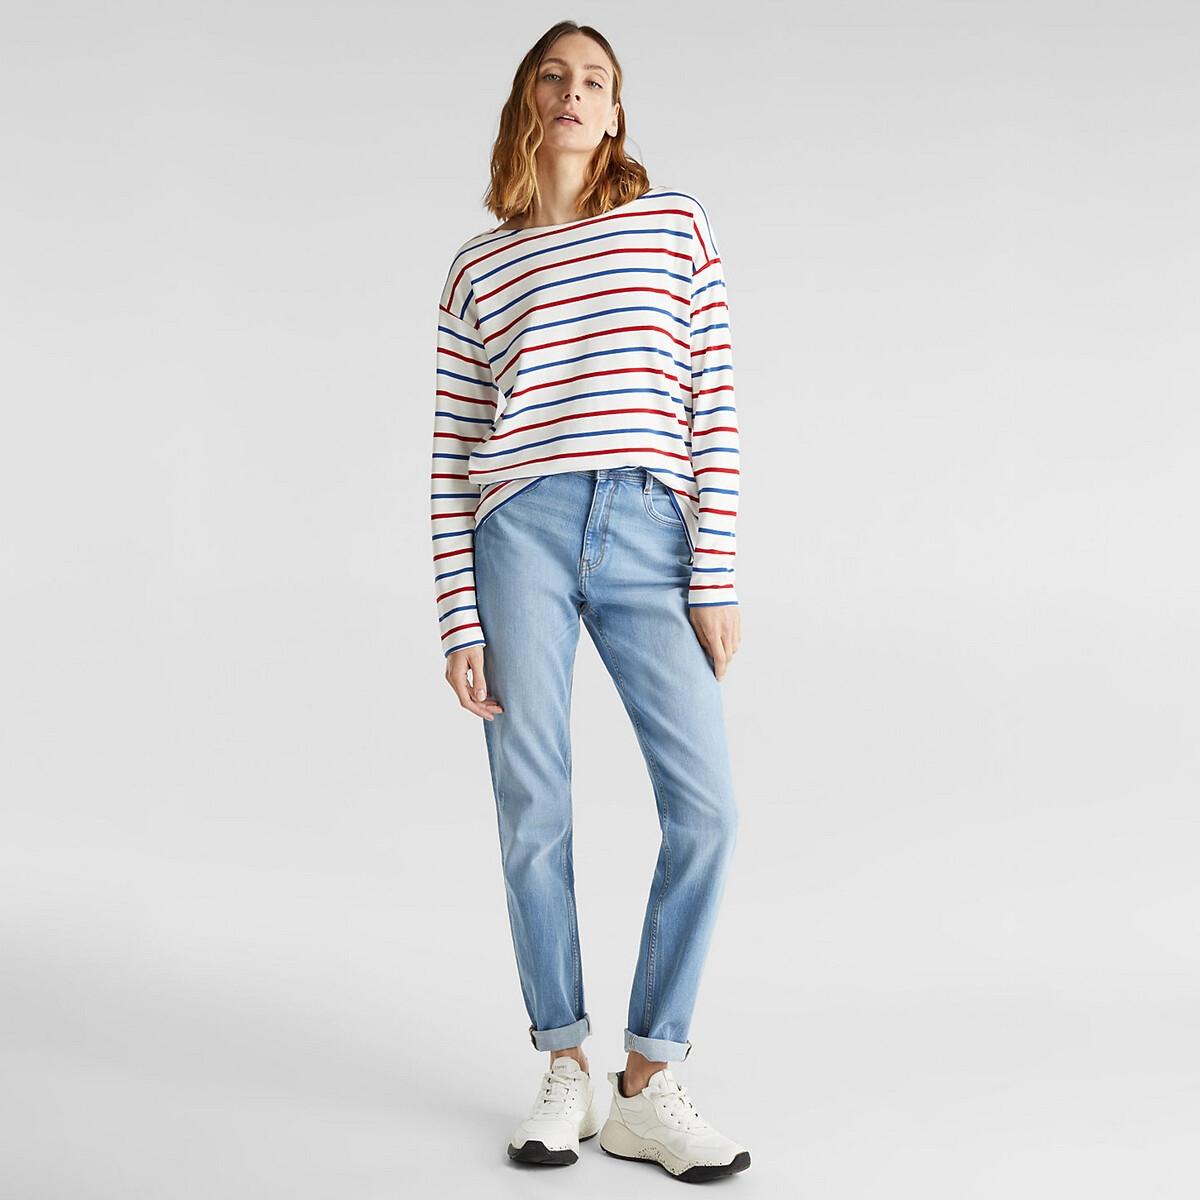 Camiseta marinera manga larga